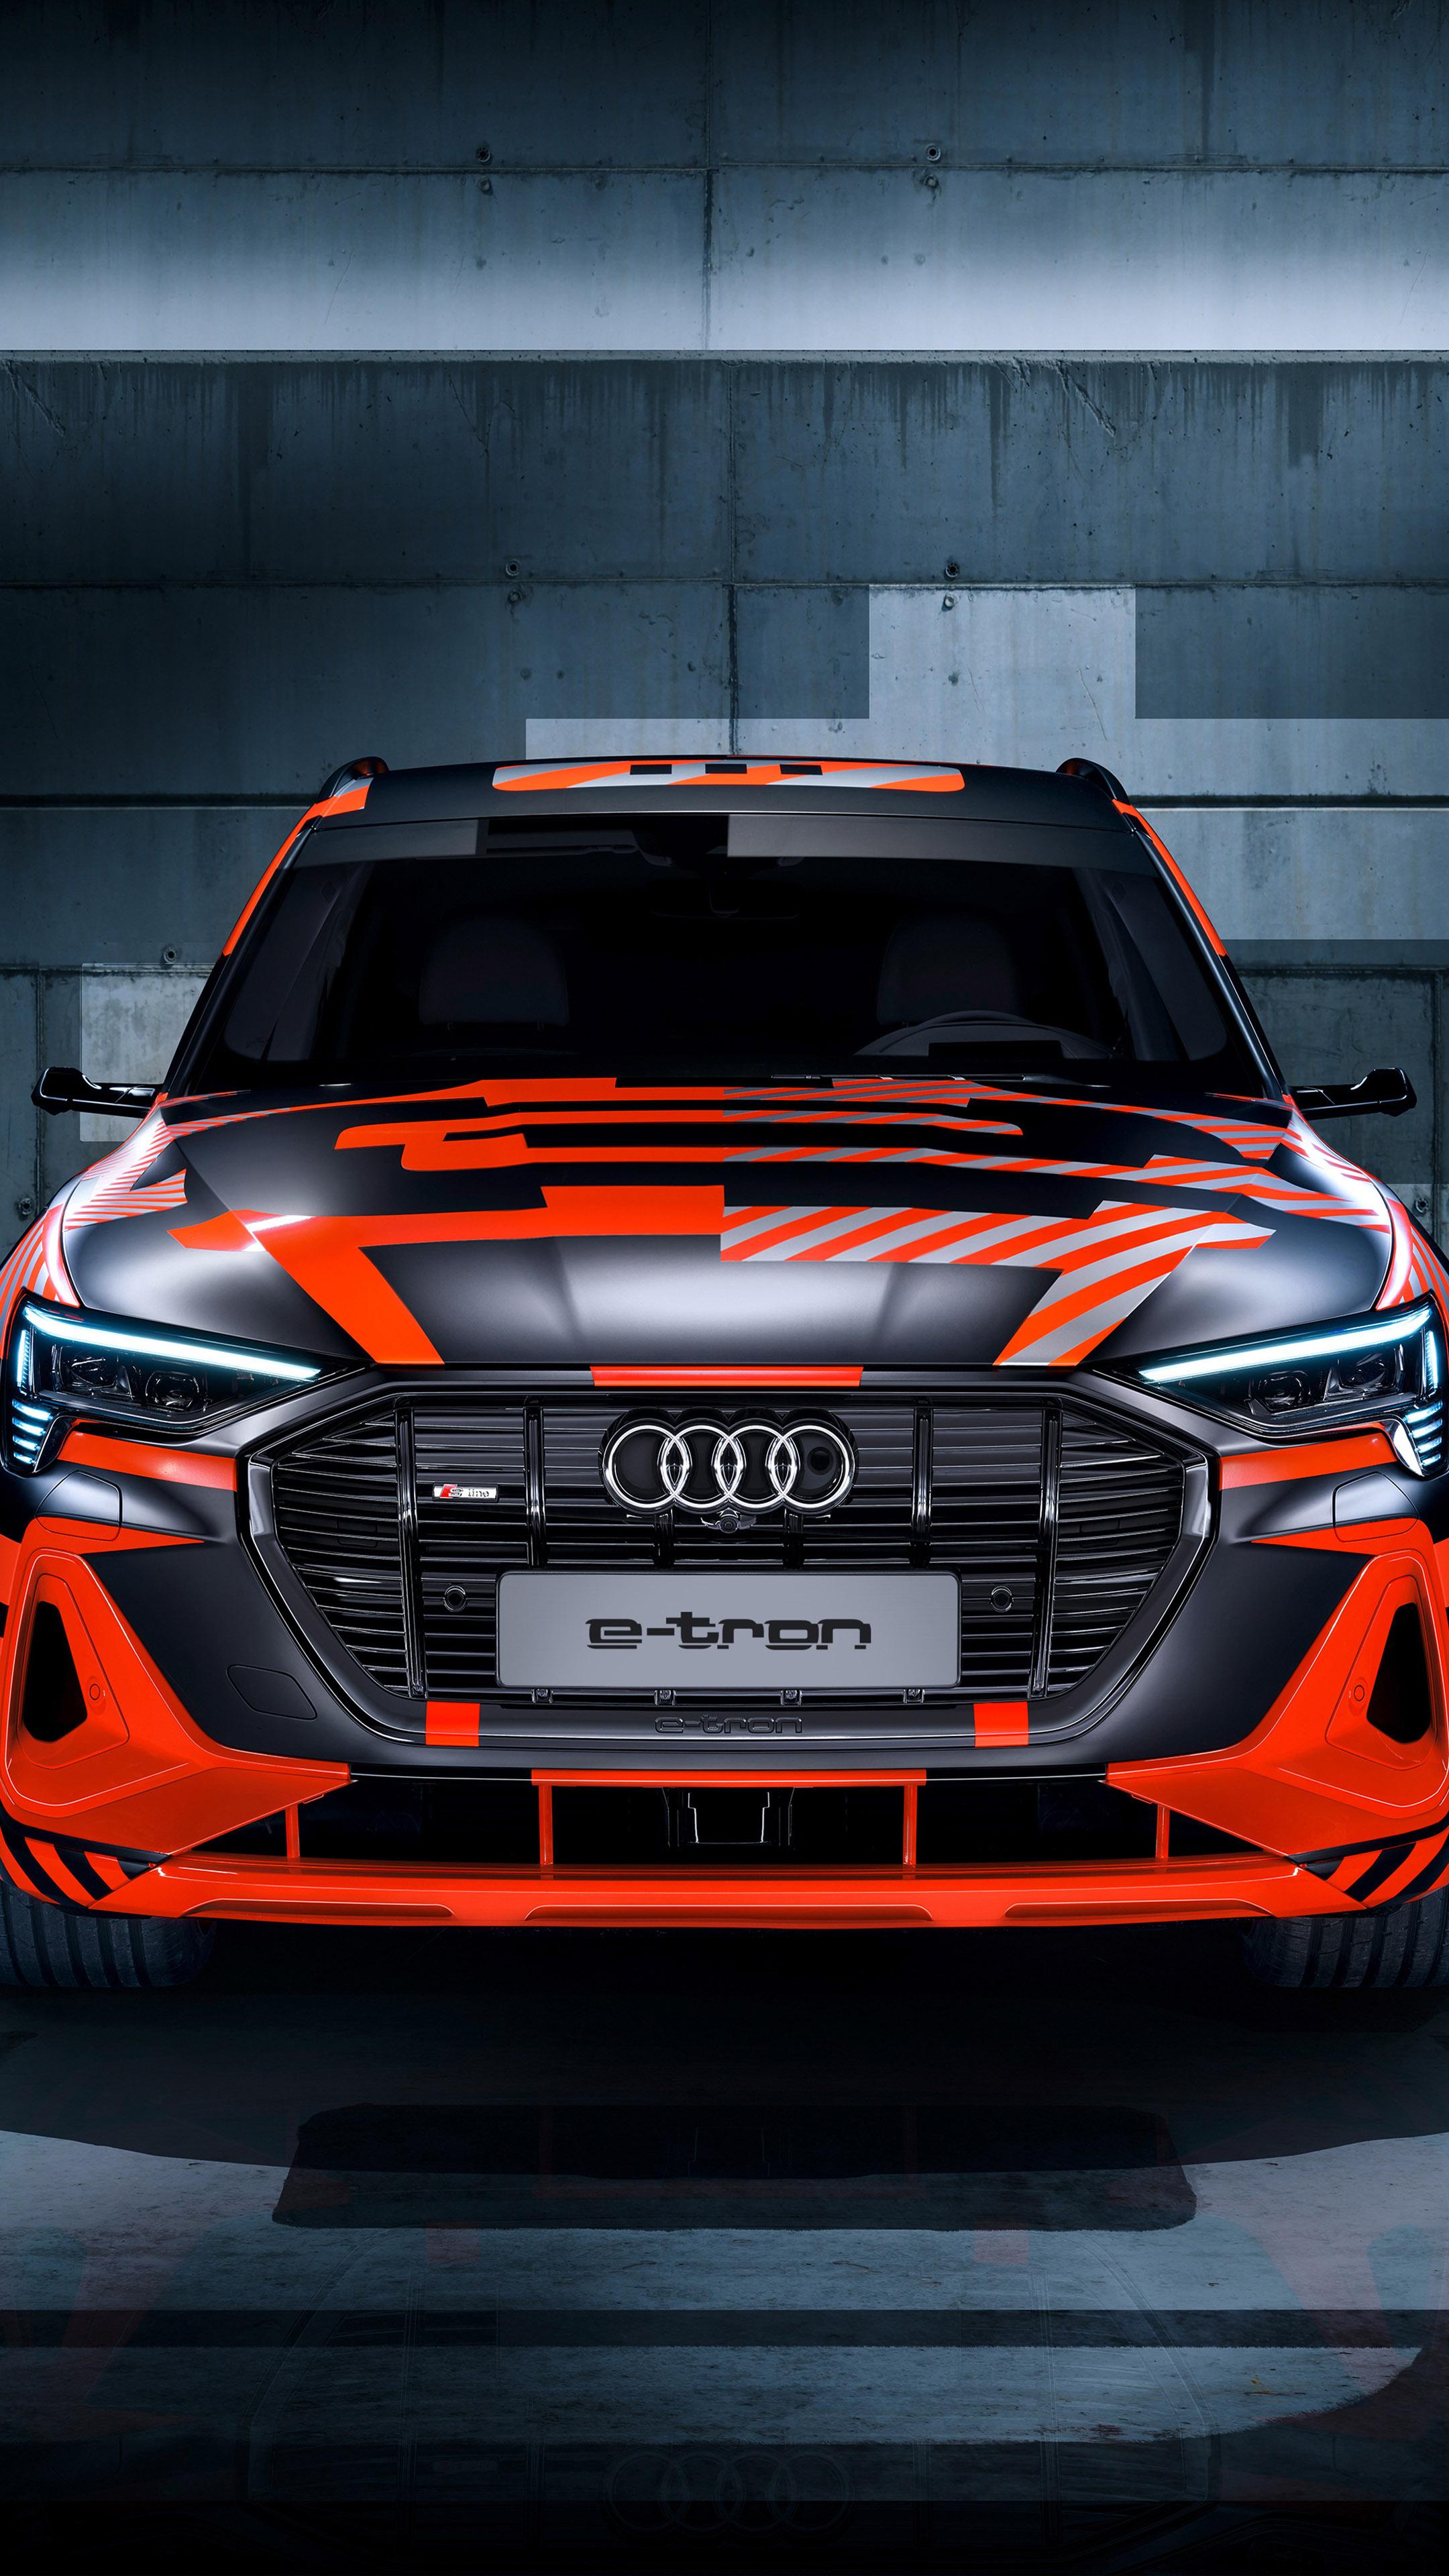 Audi E Tron Sportback Prototype Concept Cars Free 4k Ultra Hd